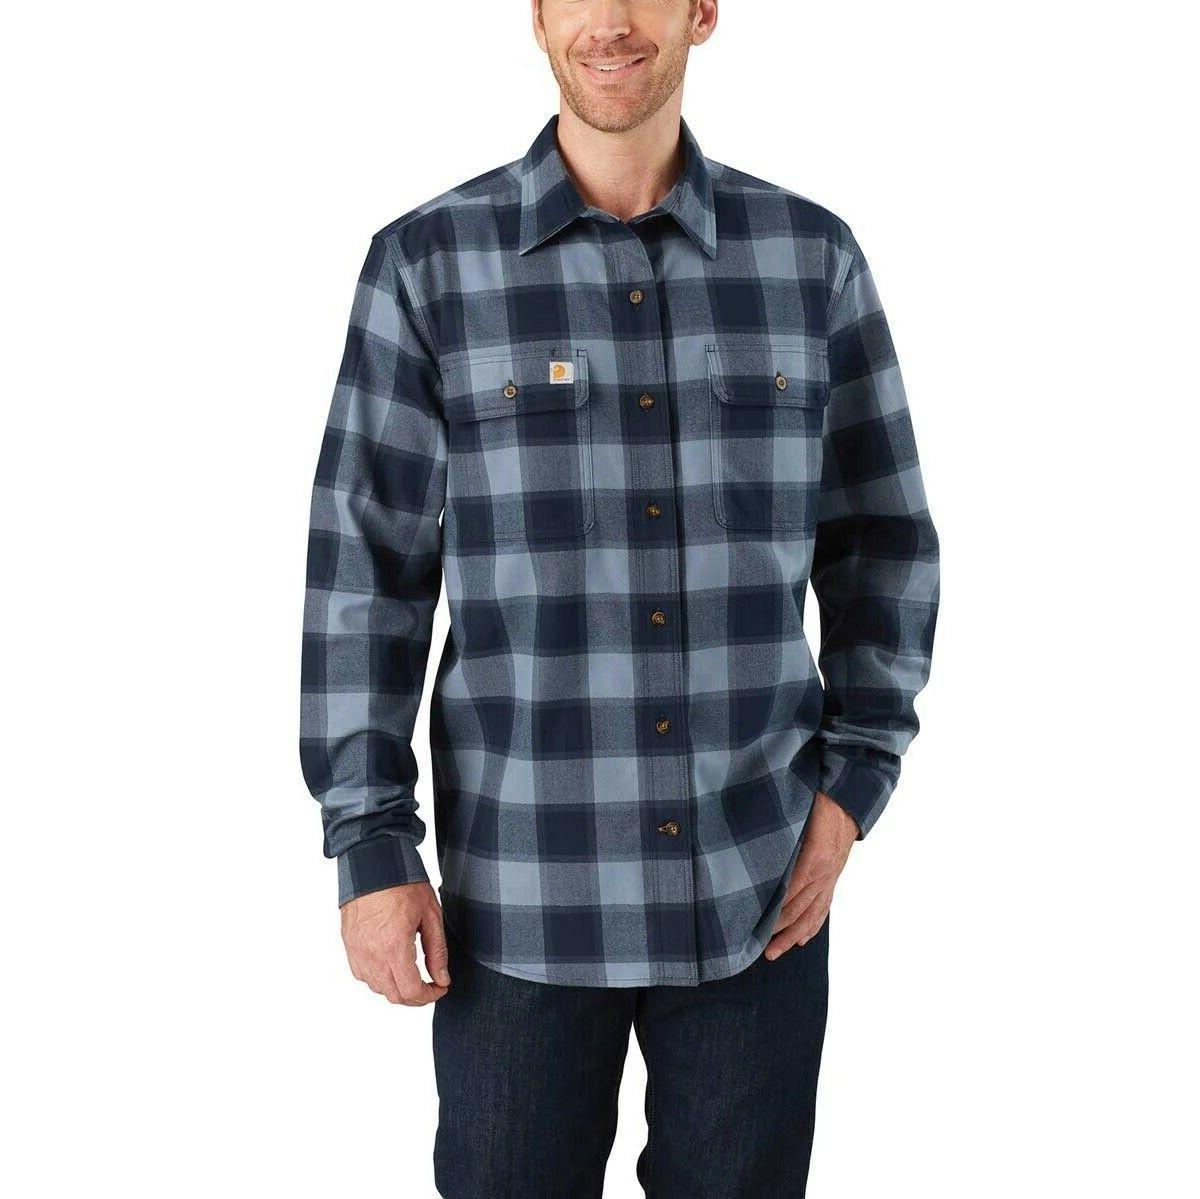 NEW Carhartt Heavy Flannel Men's Size XL-Tall Blue